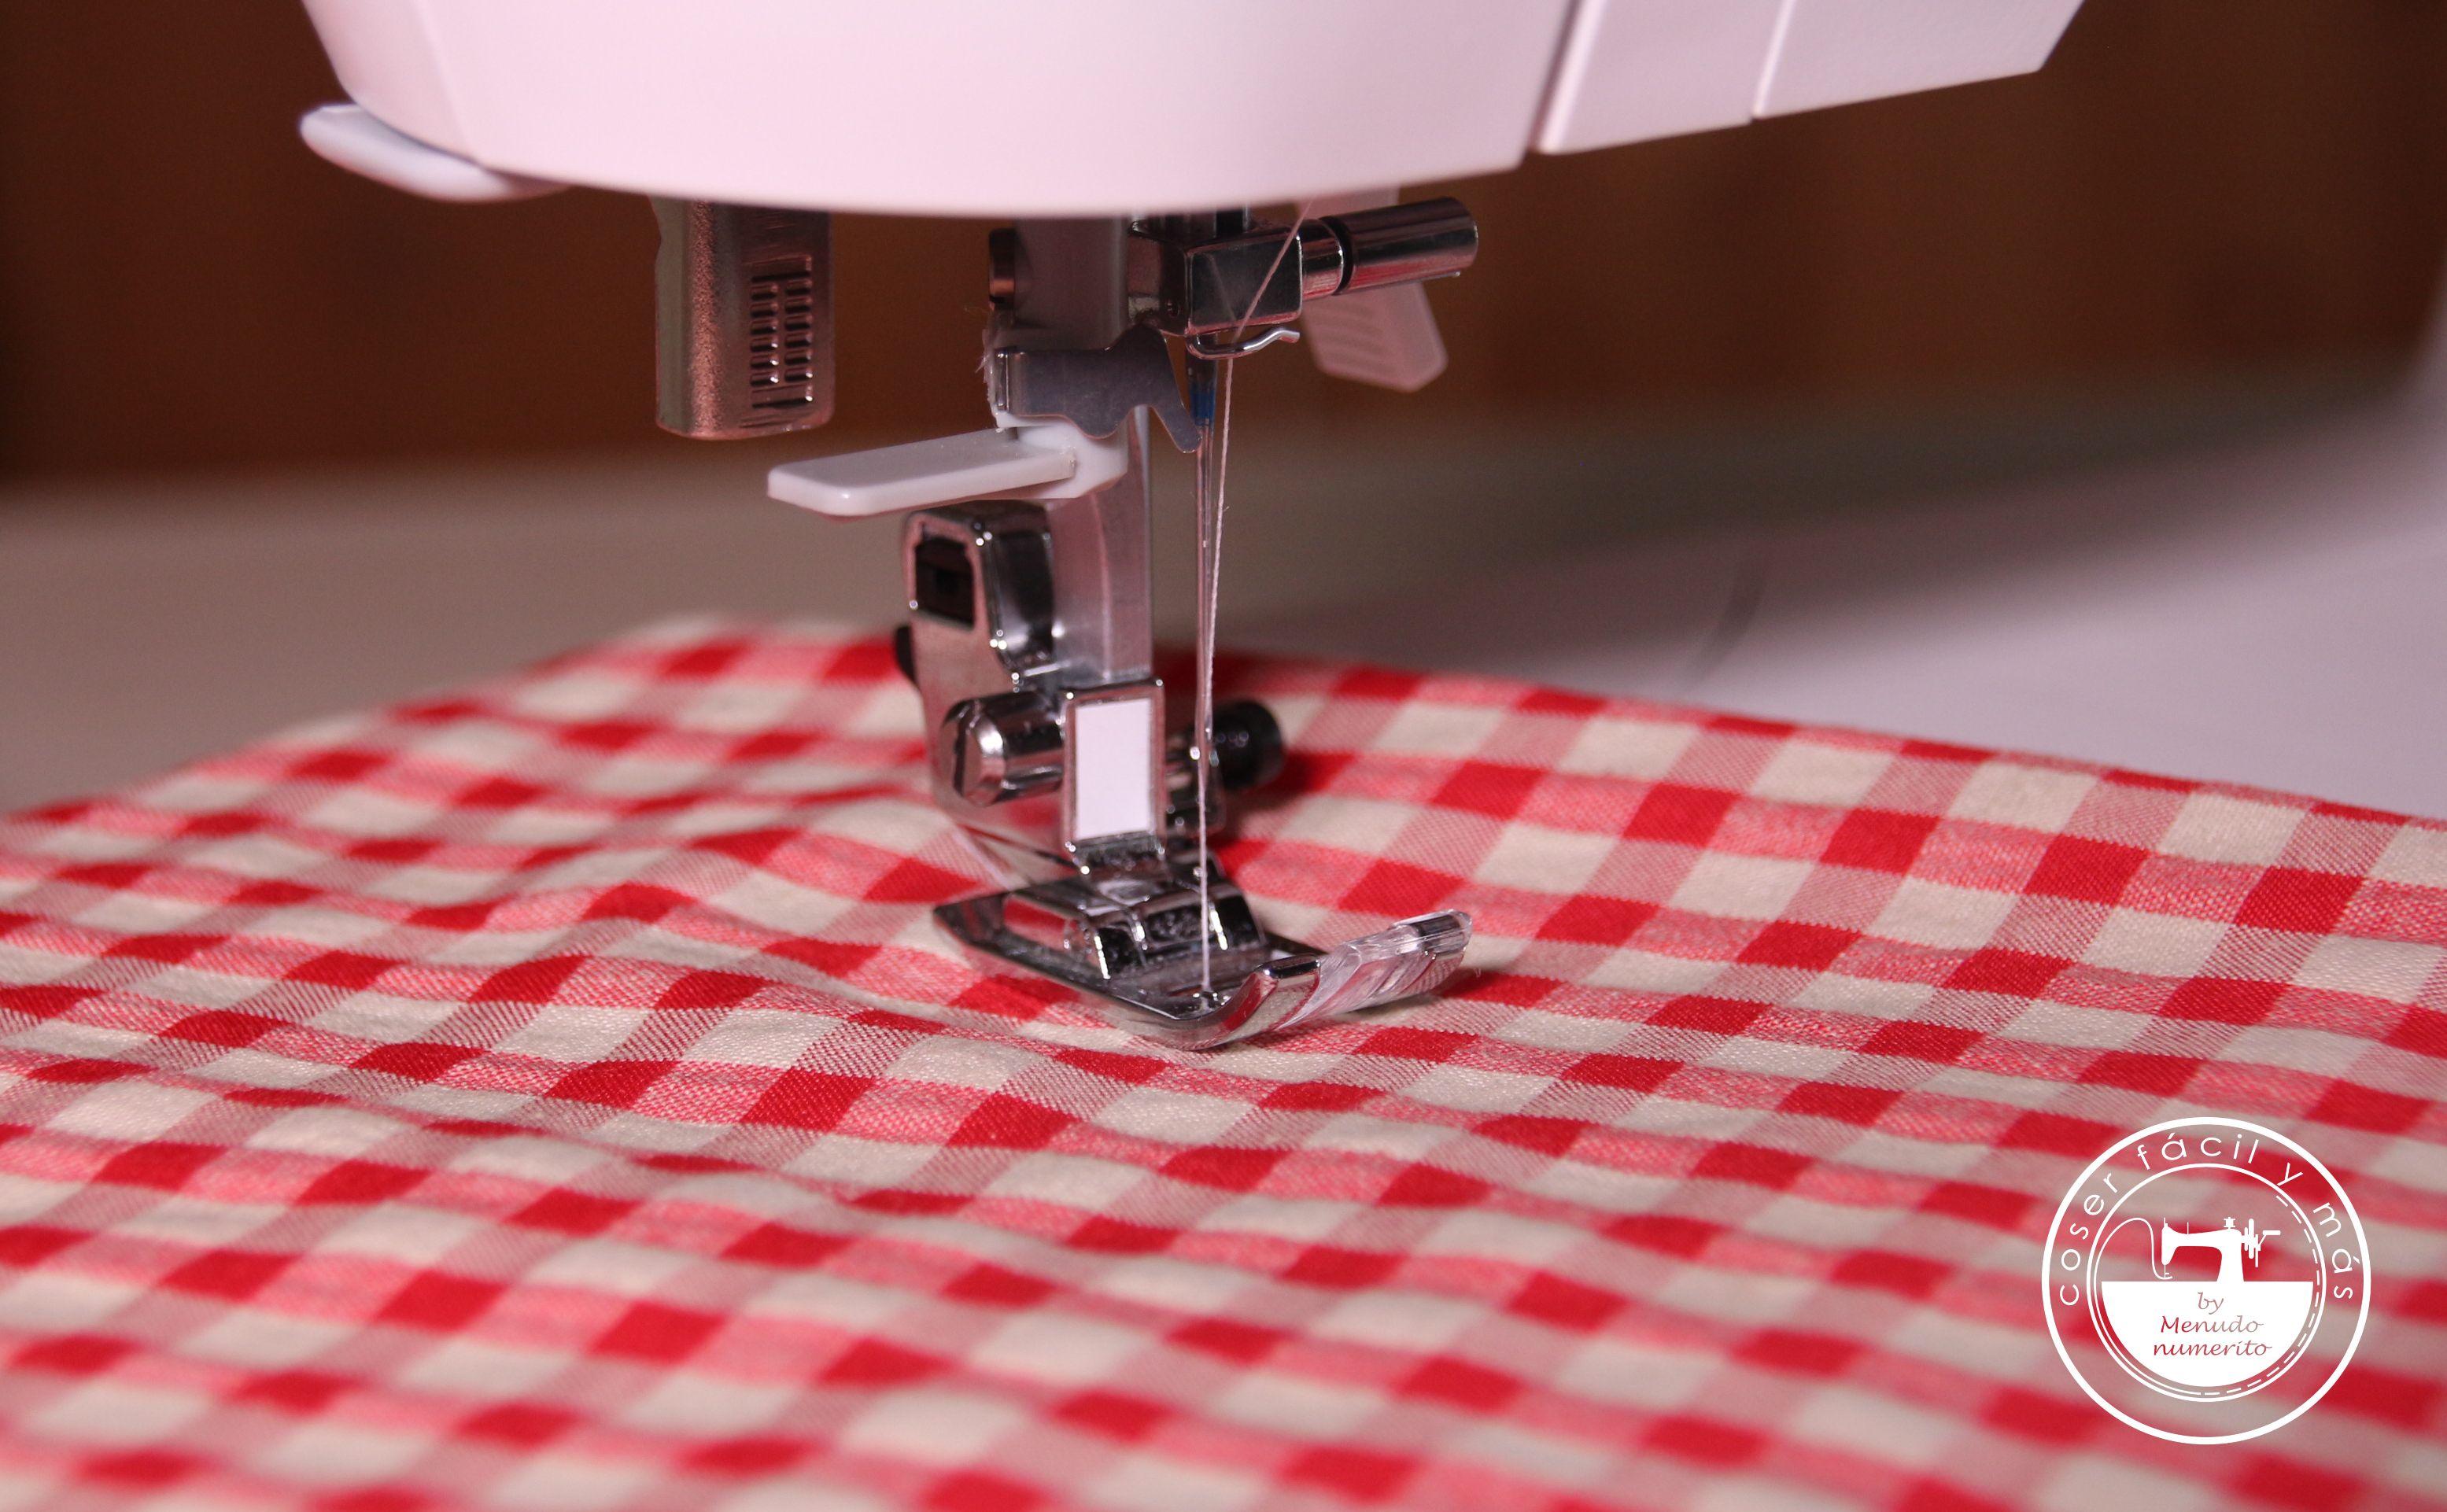 tipos de agujas coser a maquina blgos de costura menudo numerito